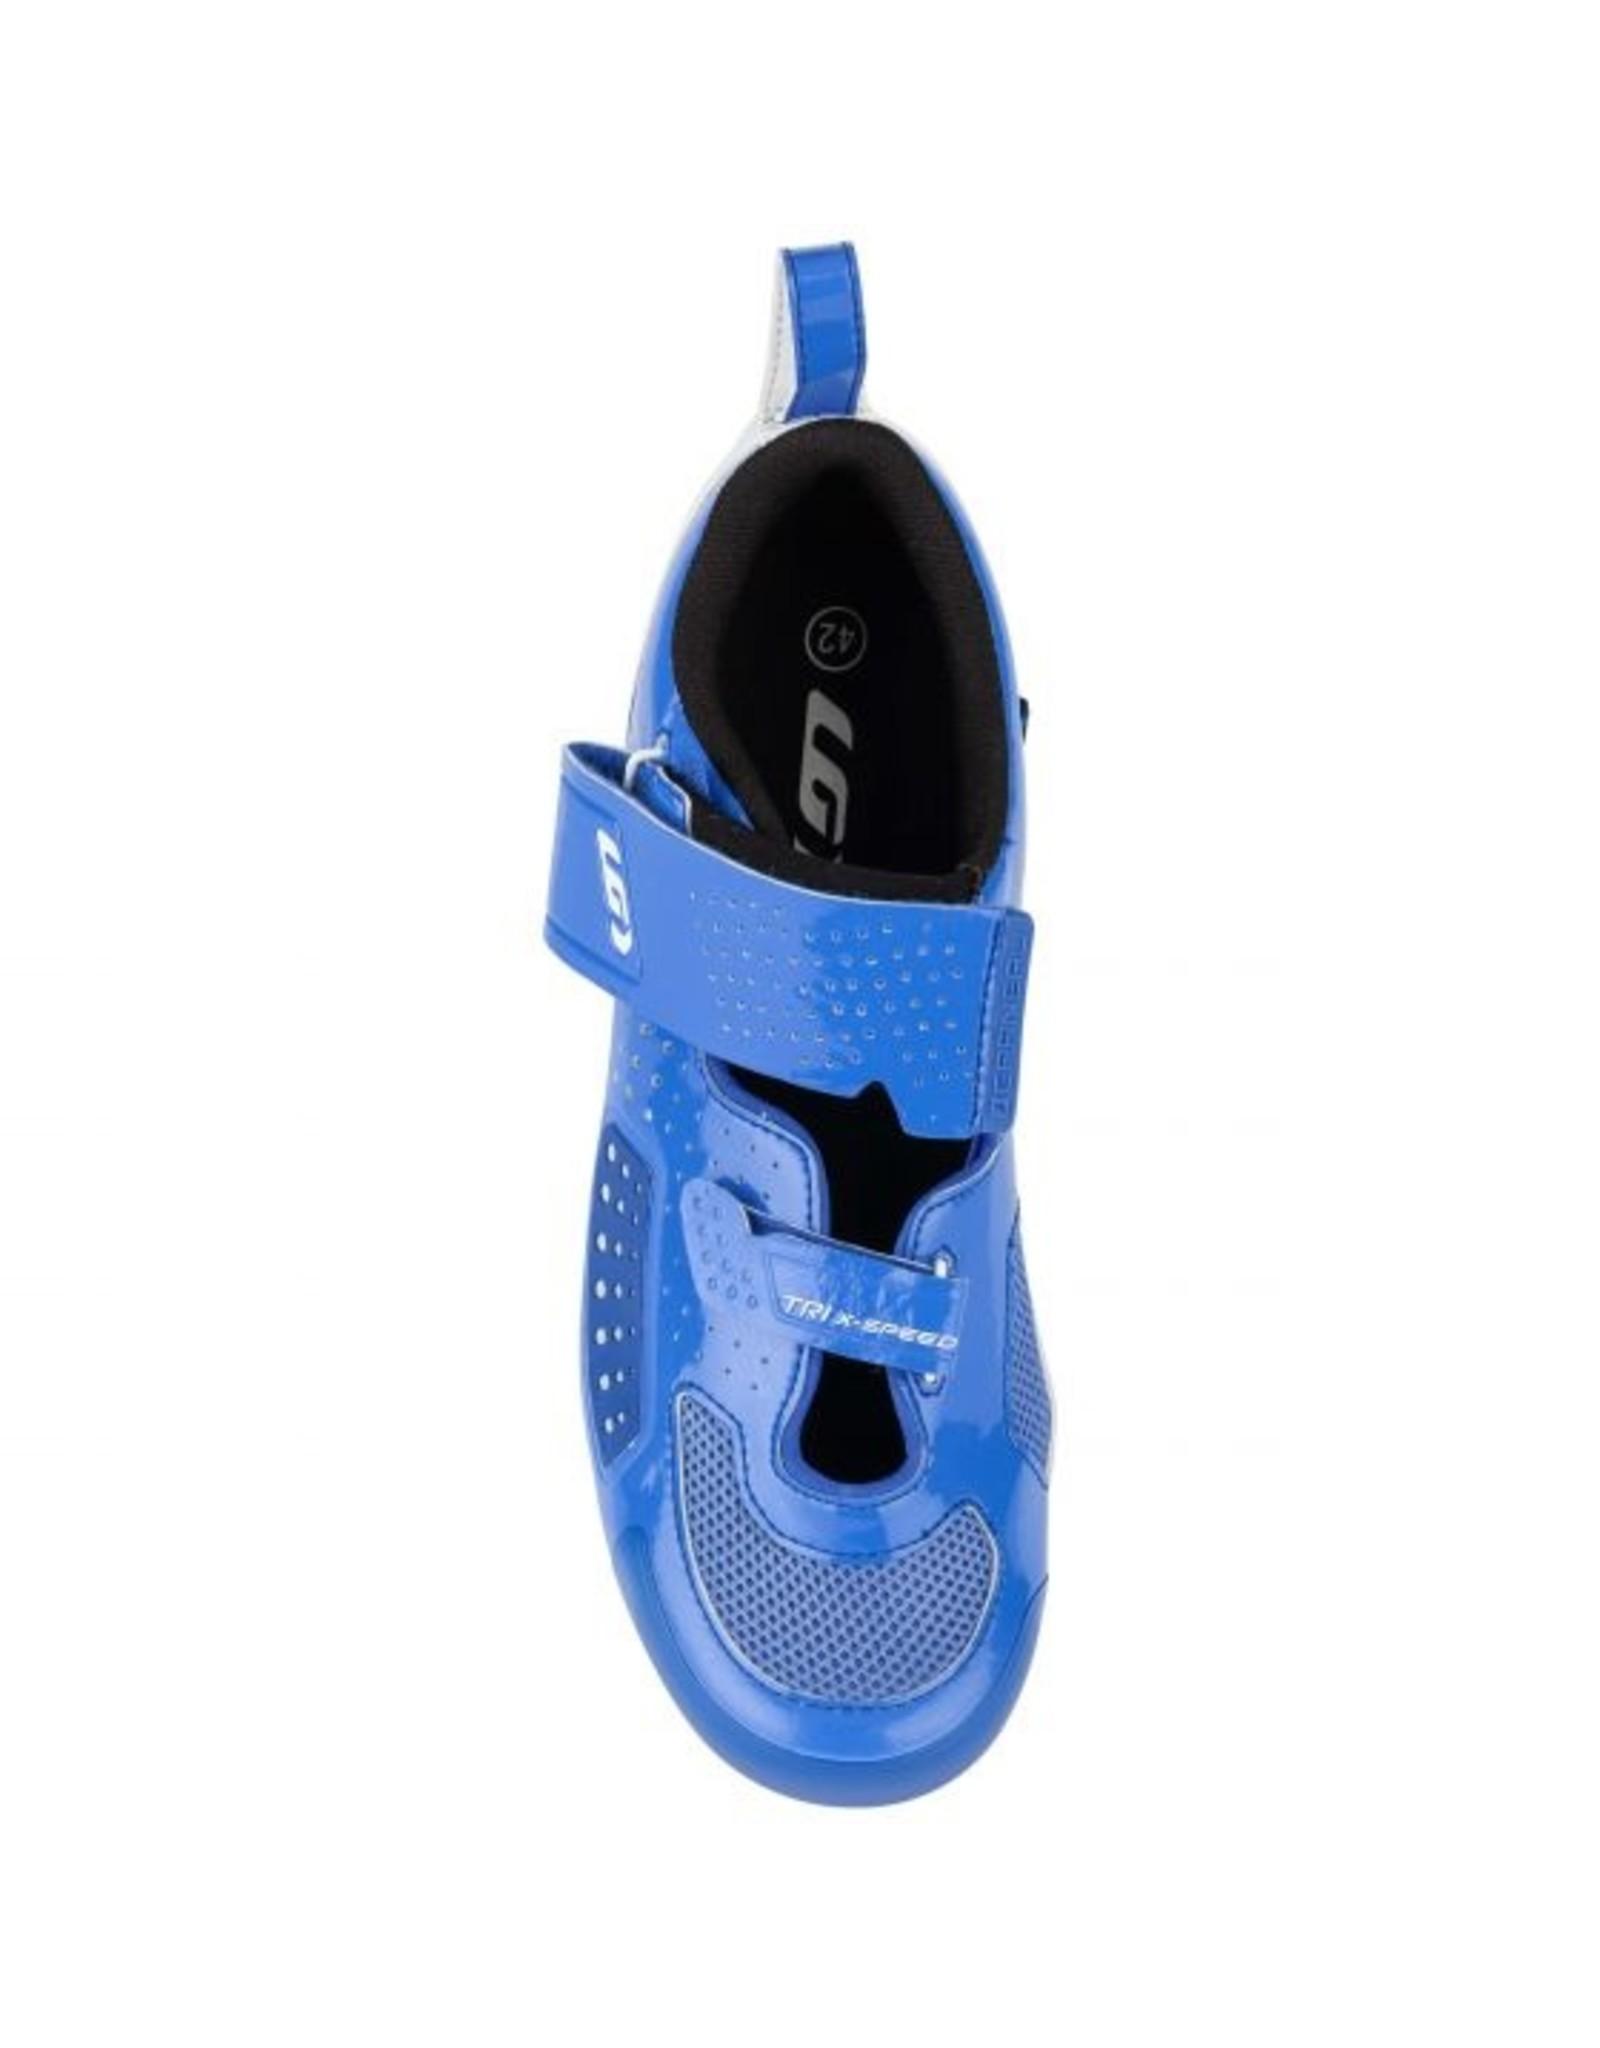 Chaussures Garneau de triathlon Tri X-Speed IV